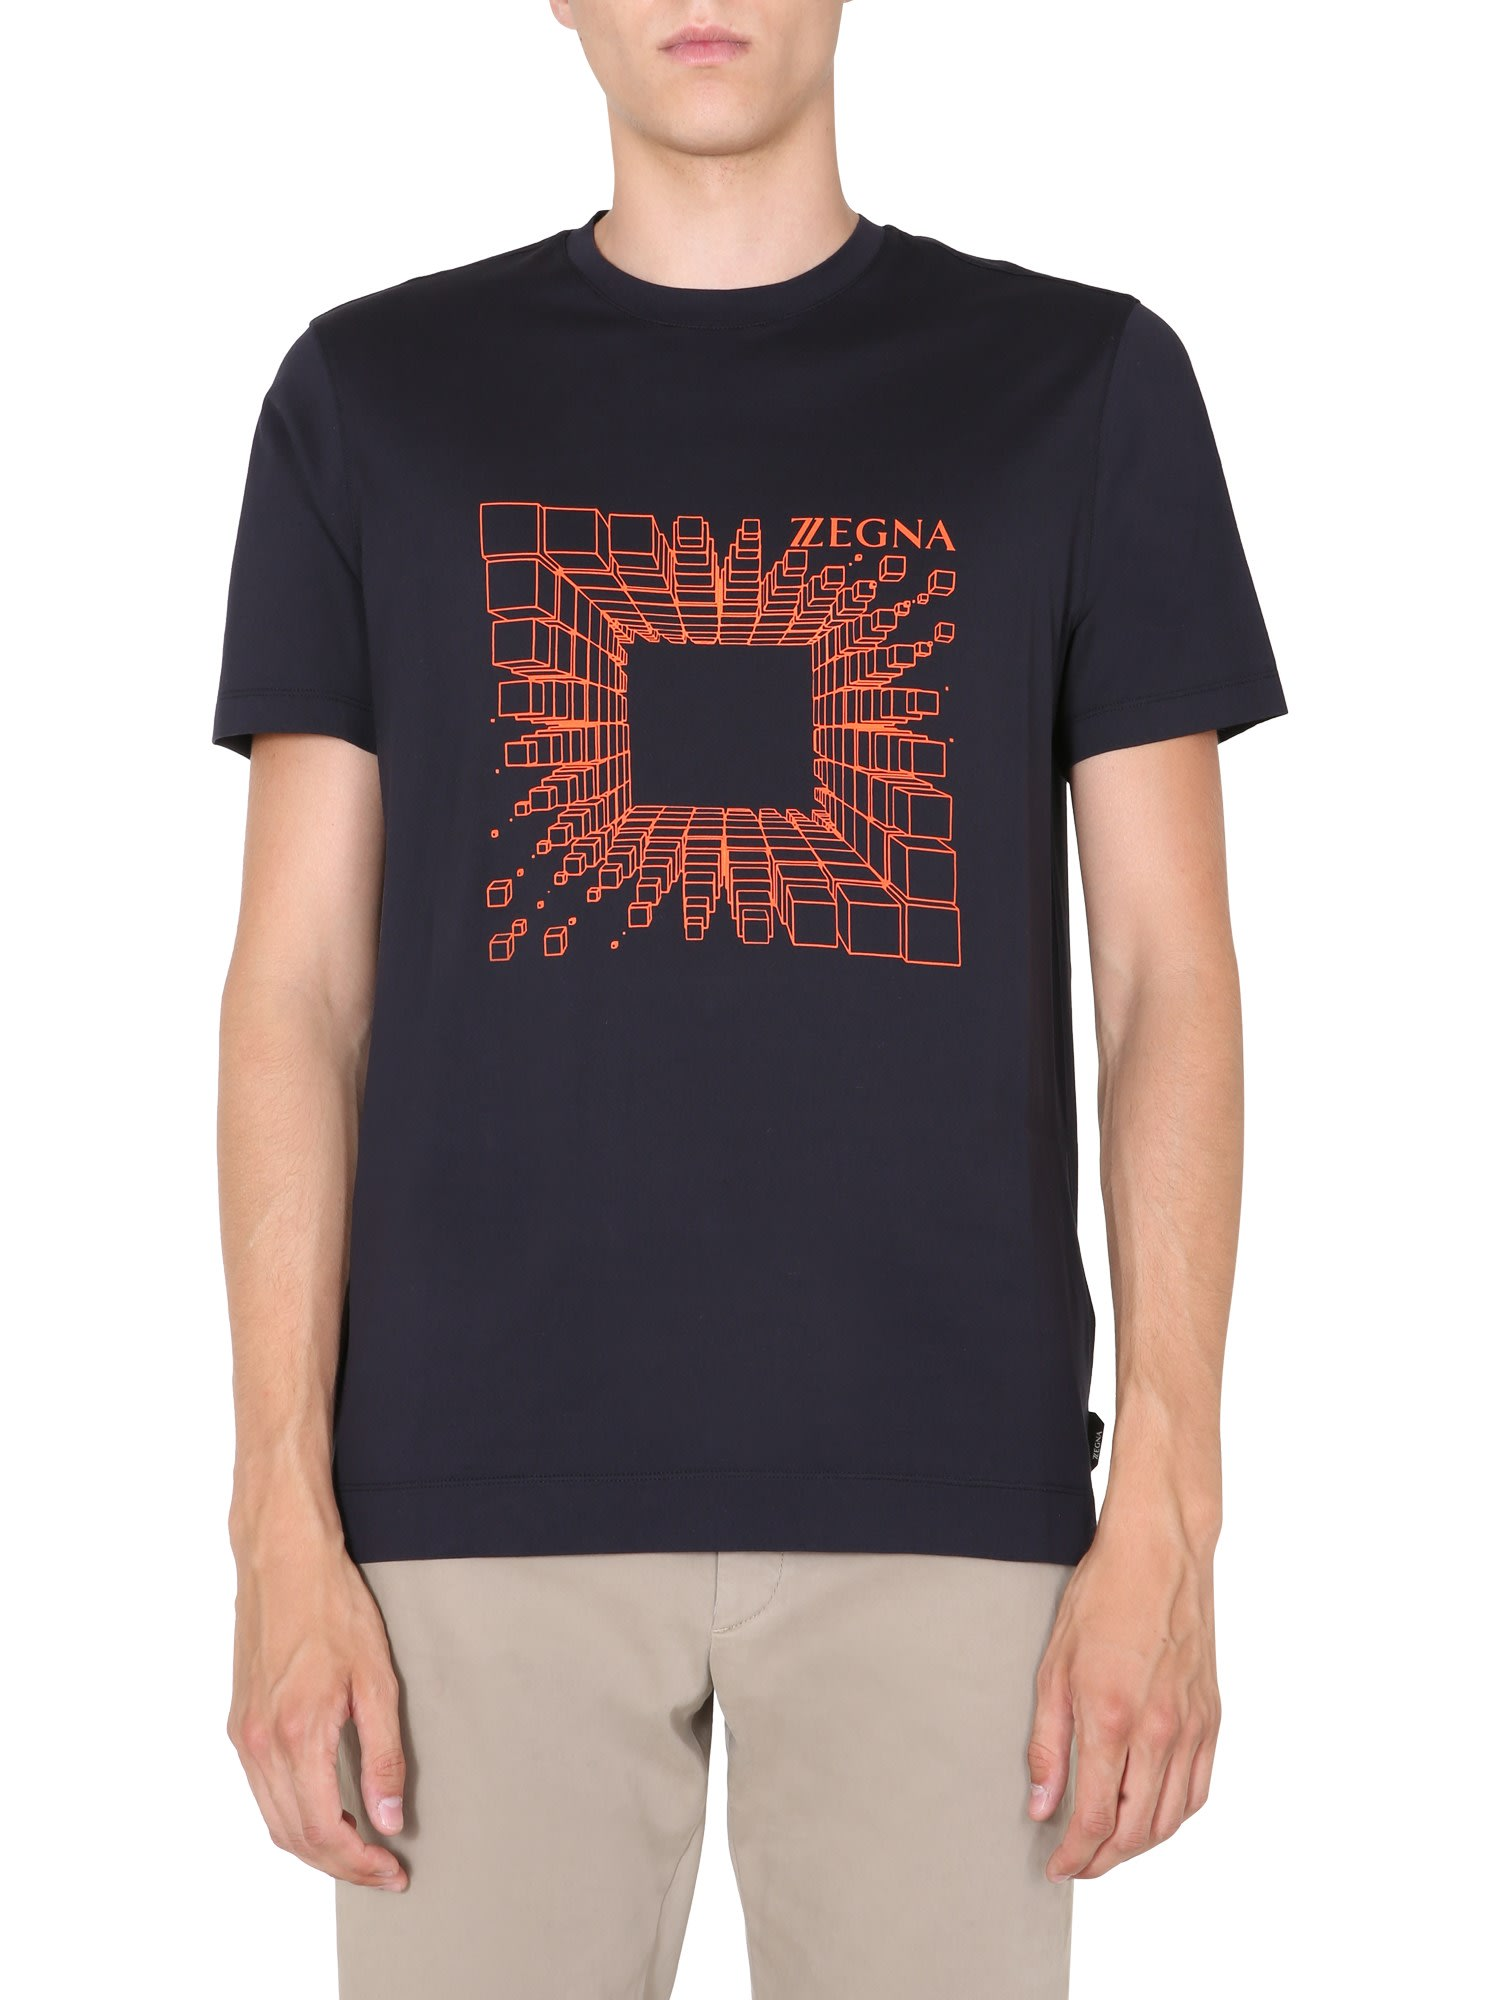 Z Zegna Slim Fit T-shirt